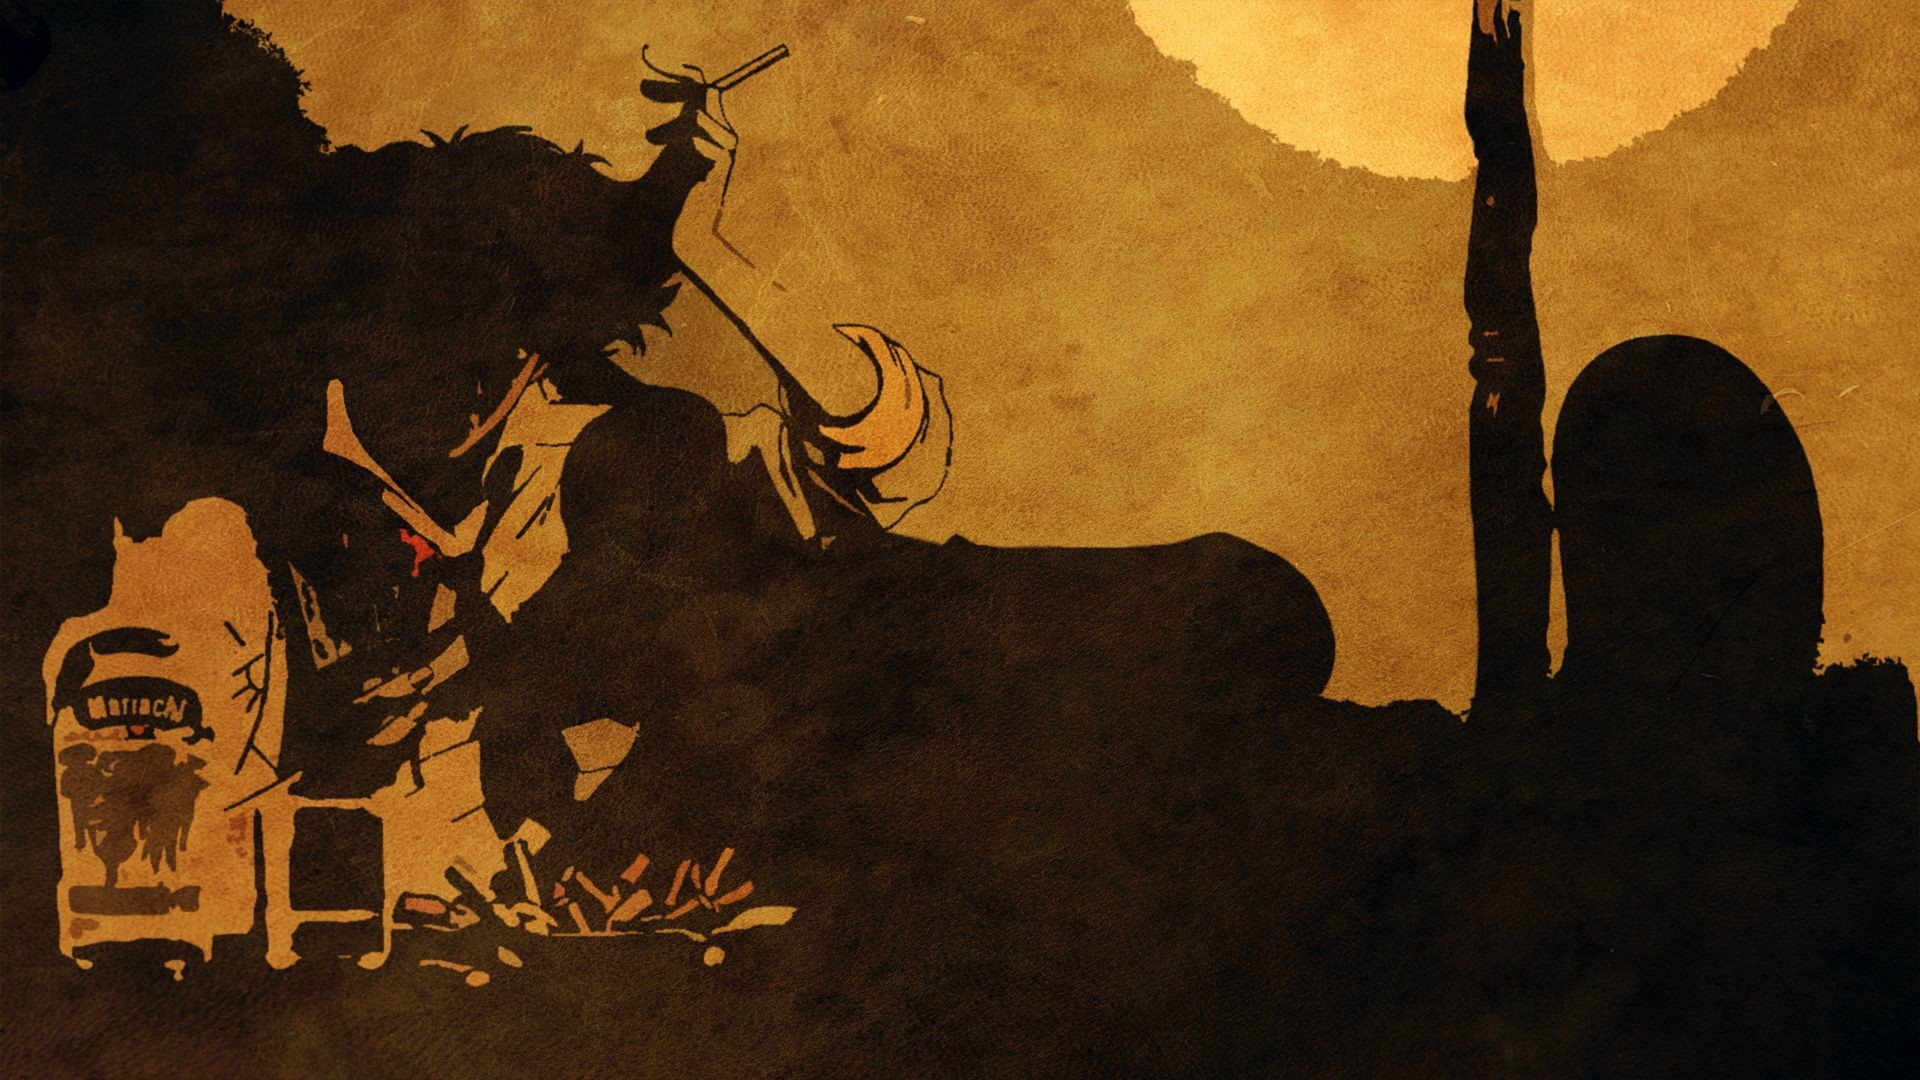 Full HD Wallpaper cowboy bebop graffiti, Desktop Backgrounds HD 1080p